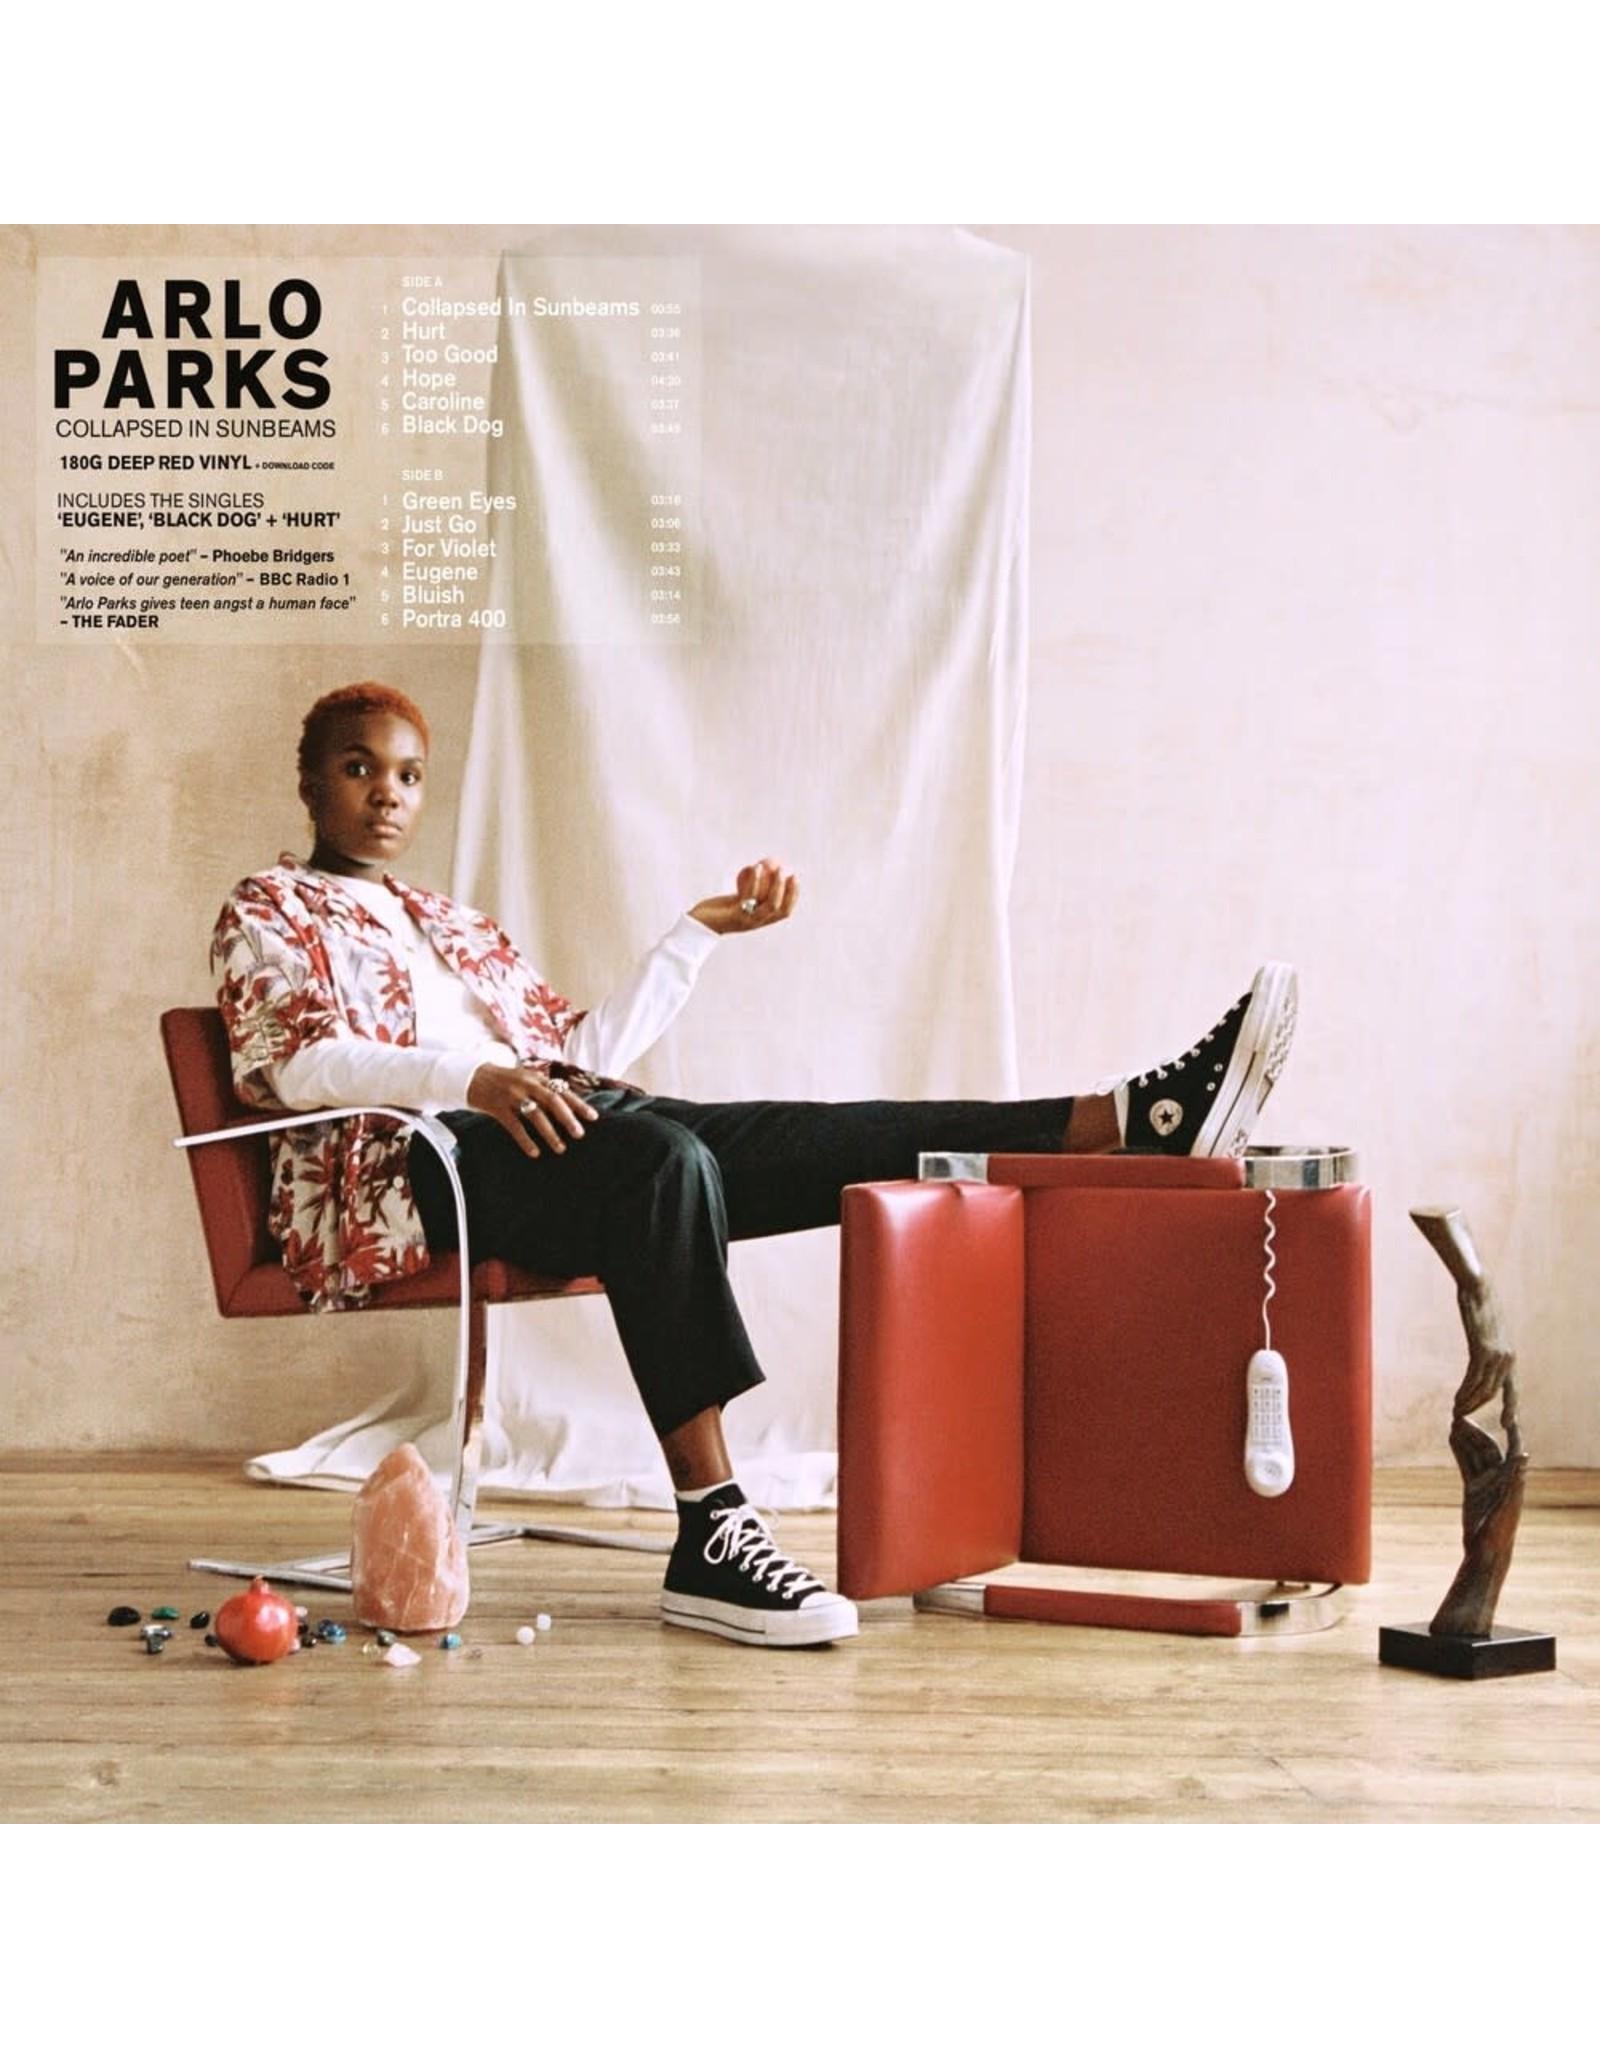 Parks, Arlo - Collapsed In Sunbeams (Deep Red 180g) LP